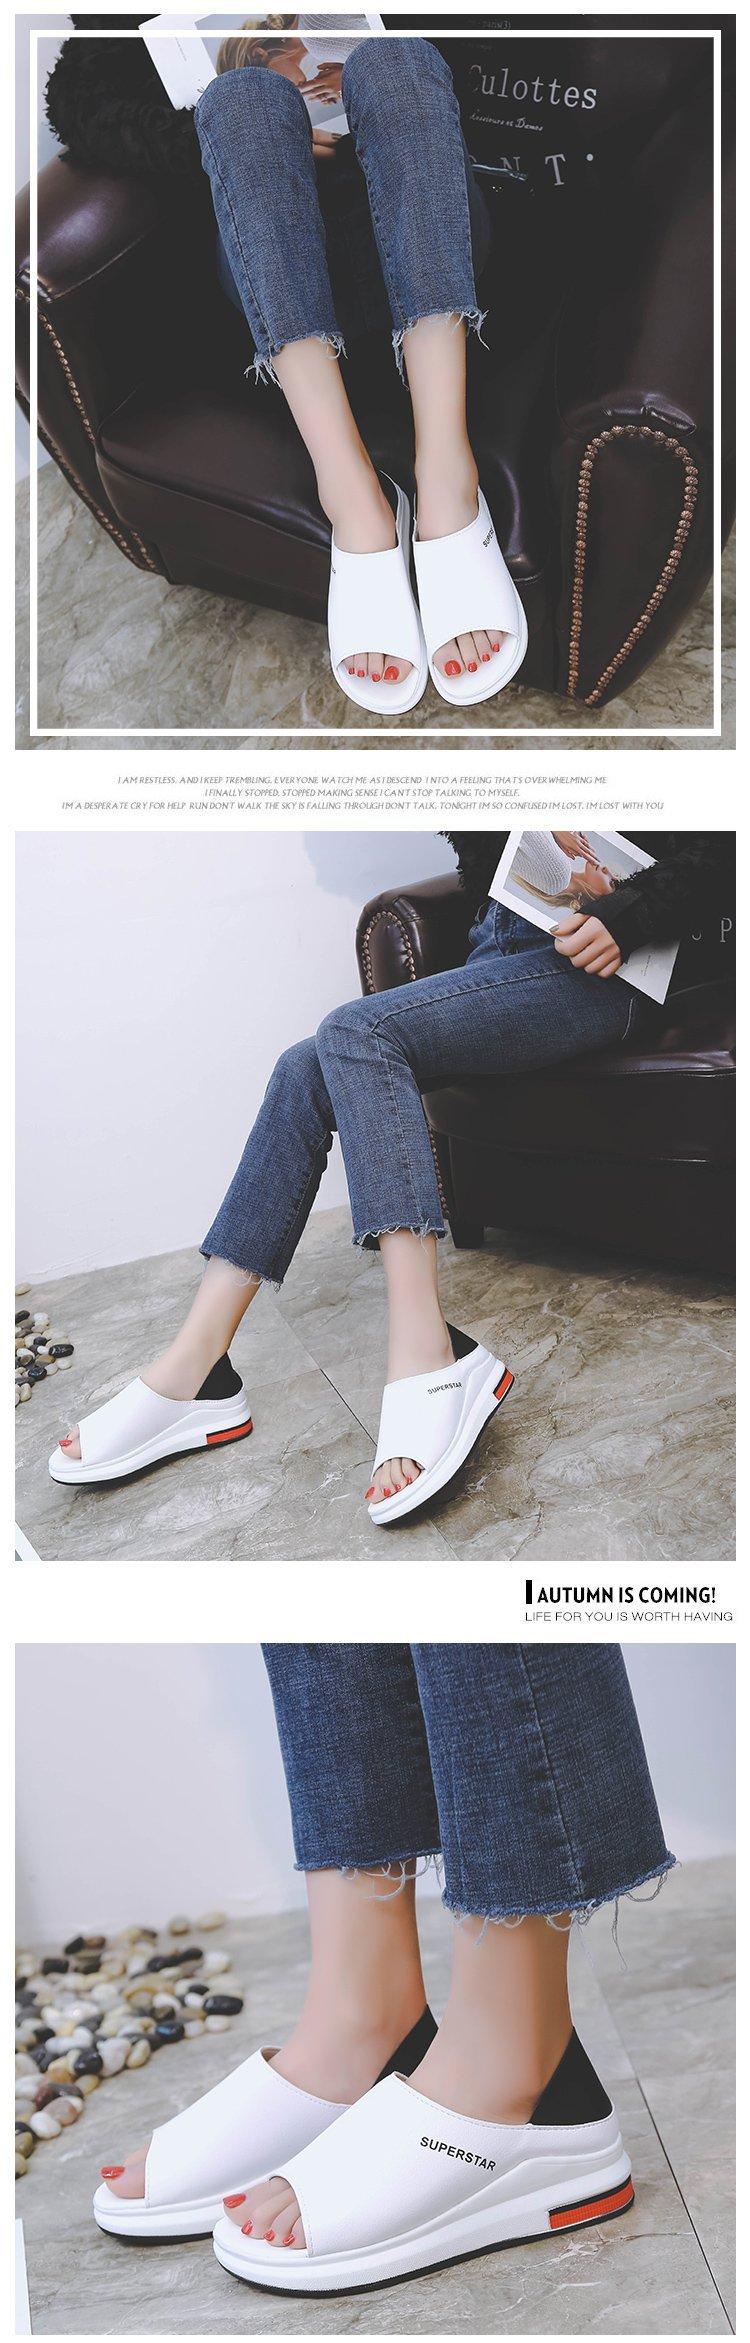 10460051418 19647336 Plus Size Summer Casual Flat Women Sandals Sport Fashion Mixed Colors Slip-On PU Leather Non-slip Platform Beach Women Shoes